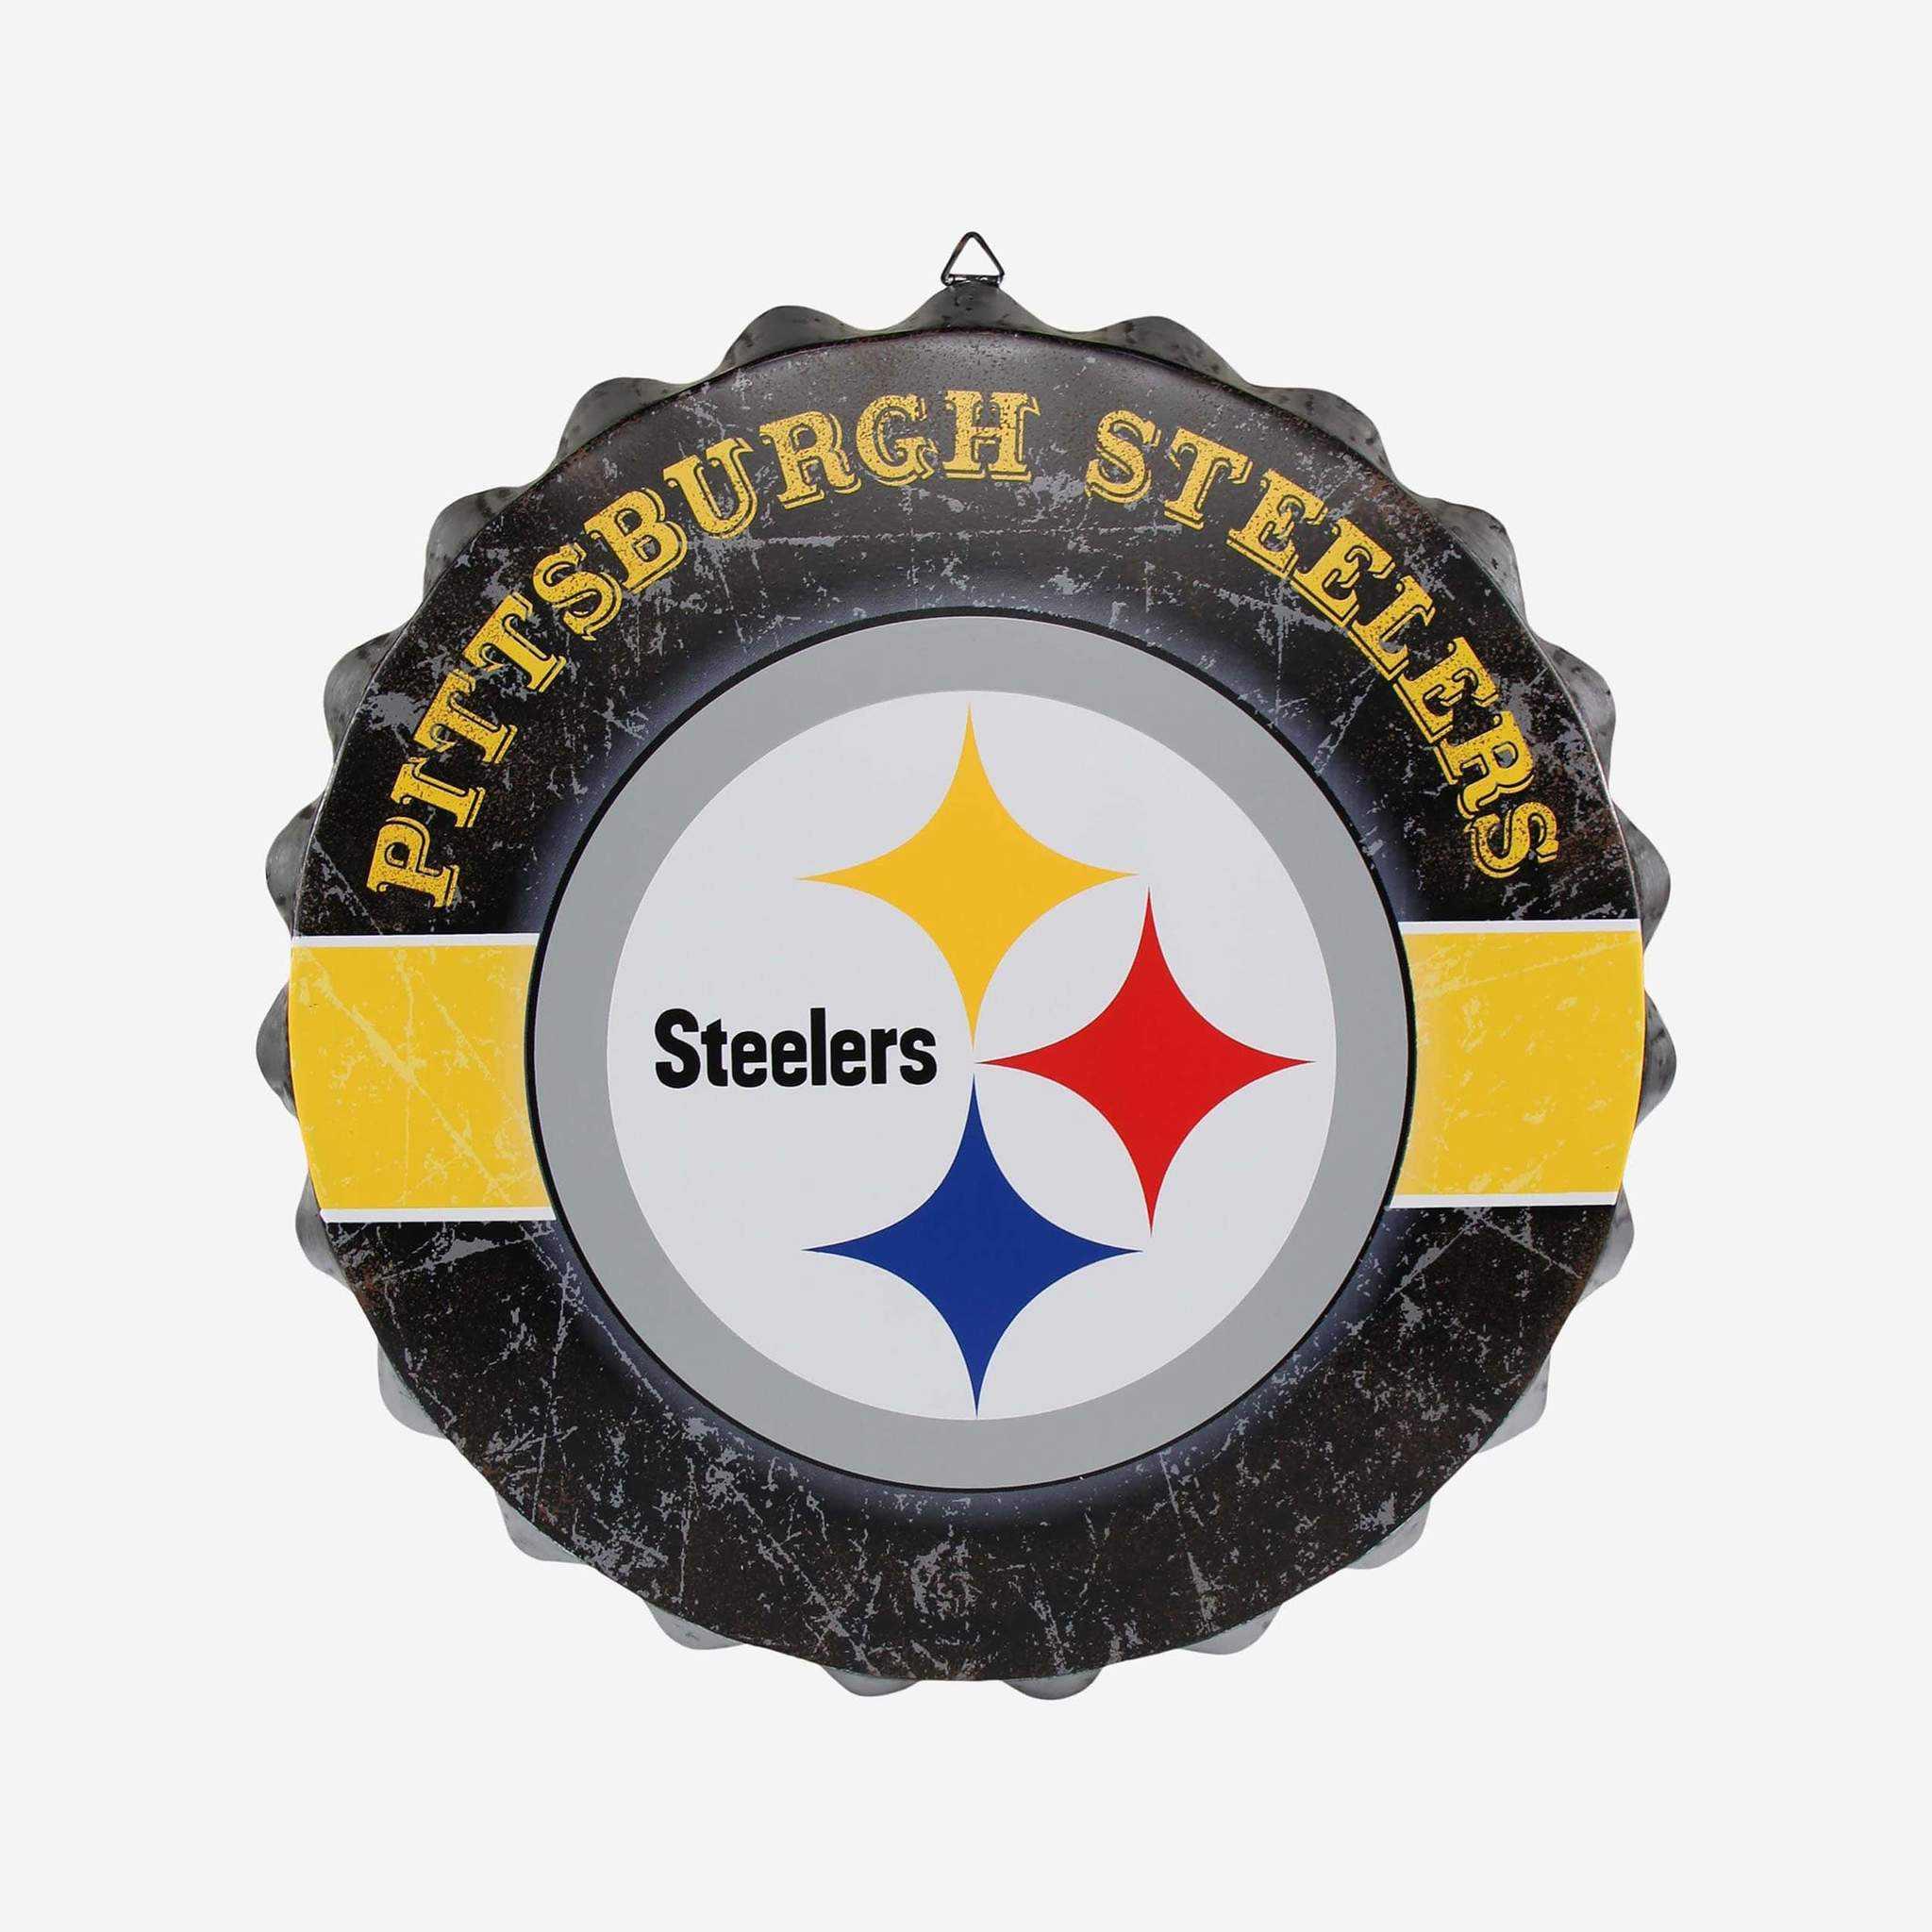 Metal Distressed Bottle Cap Sign-Pittsburgh Steelers